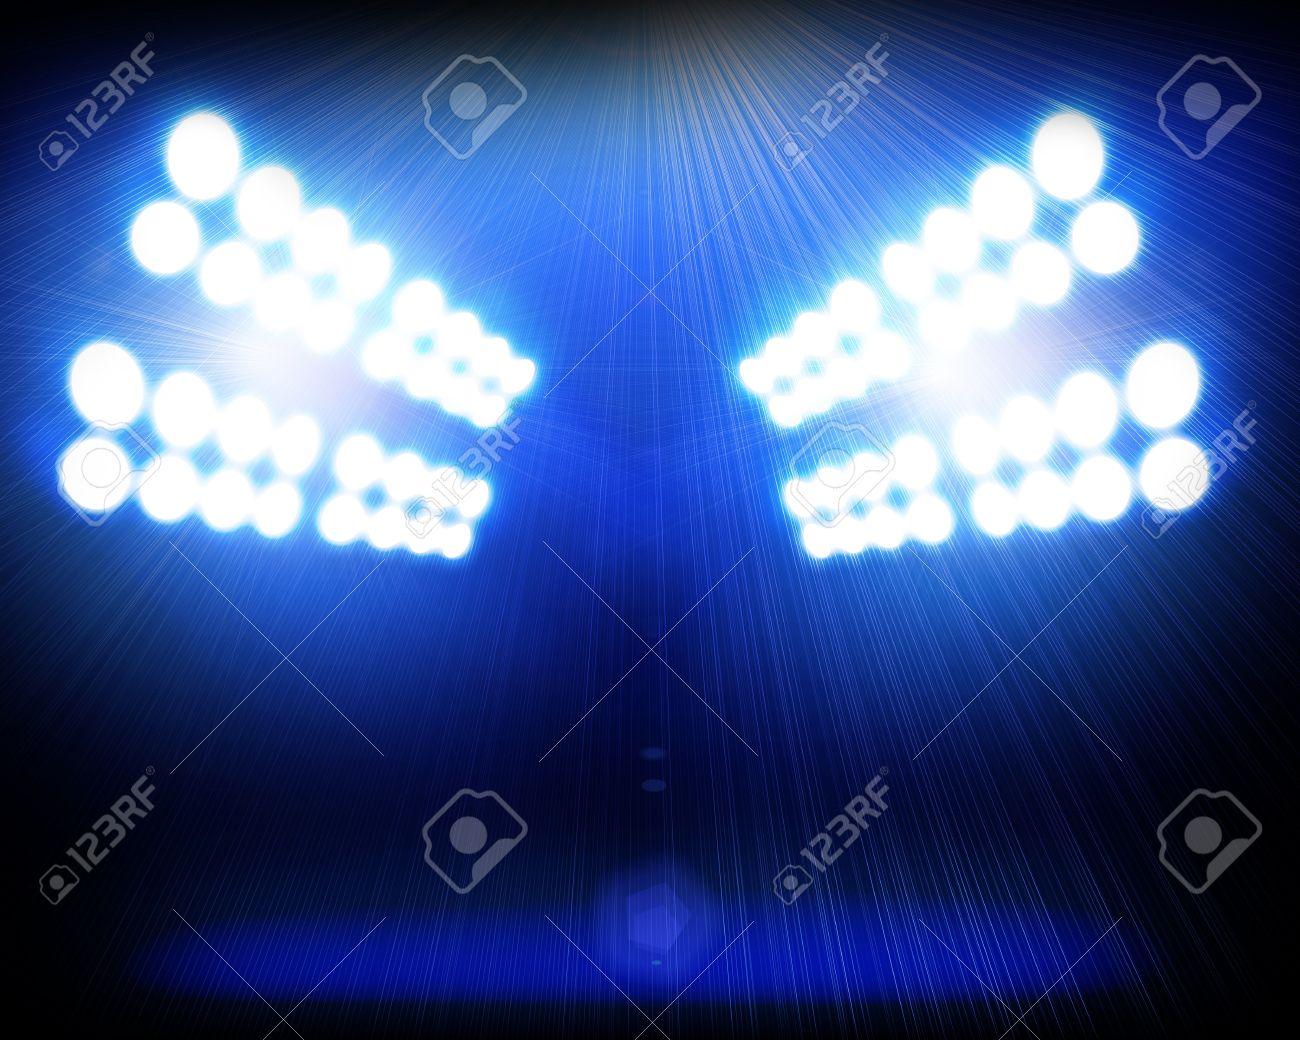 Blue spotlights background Stock Photo - 12695392